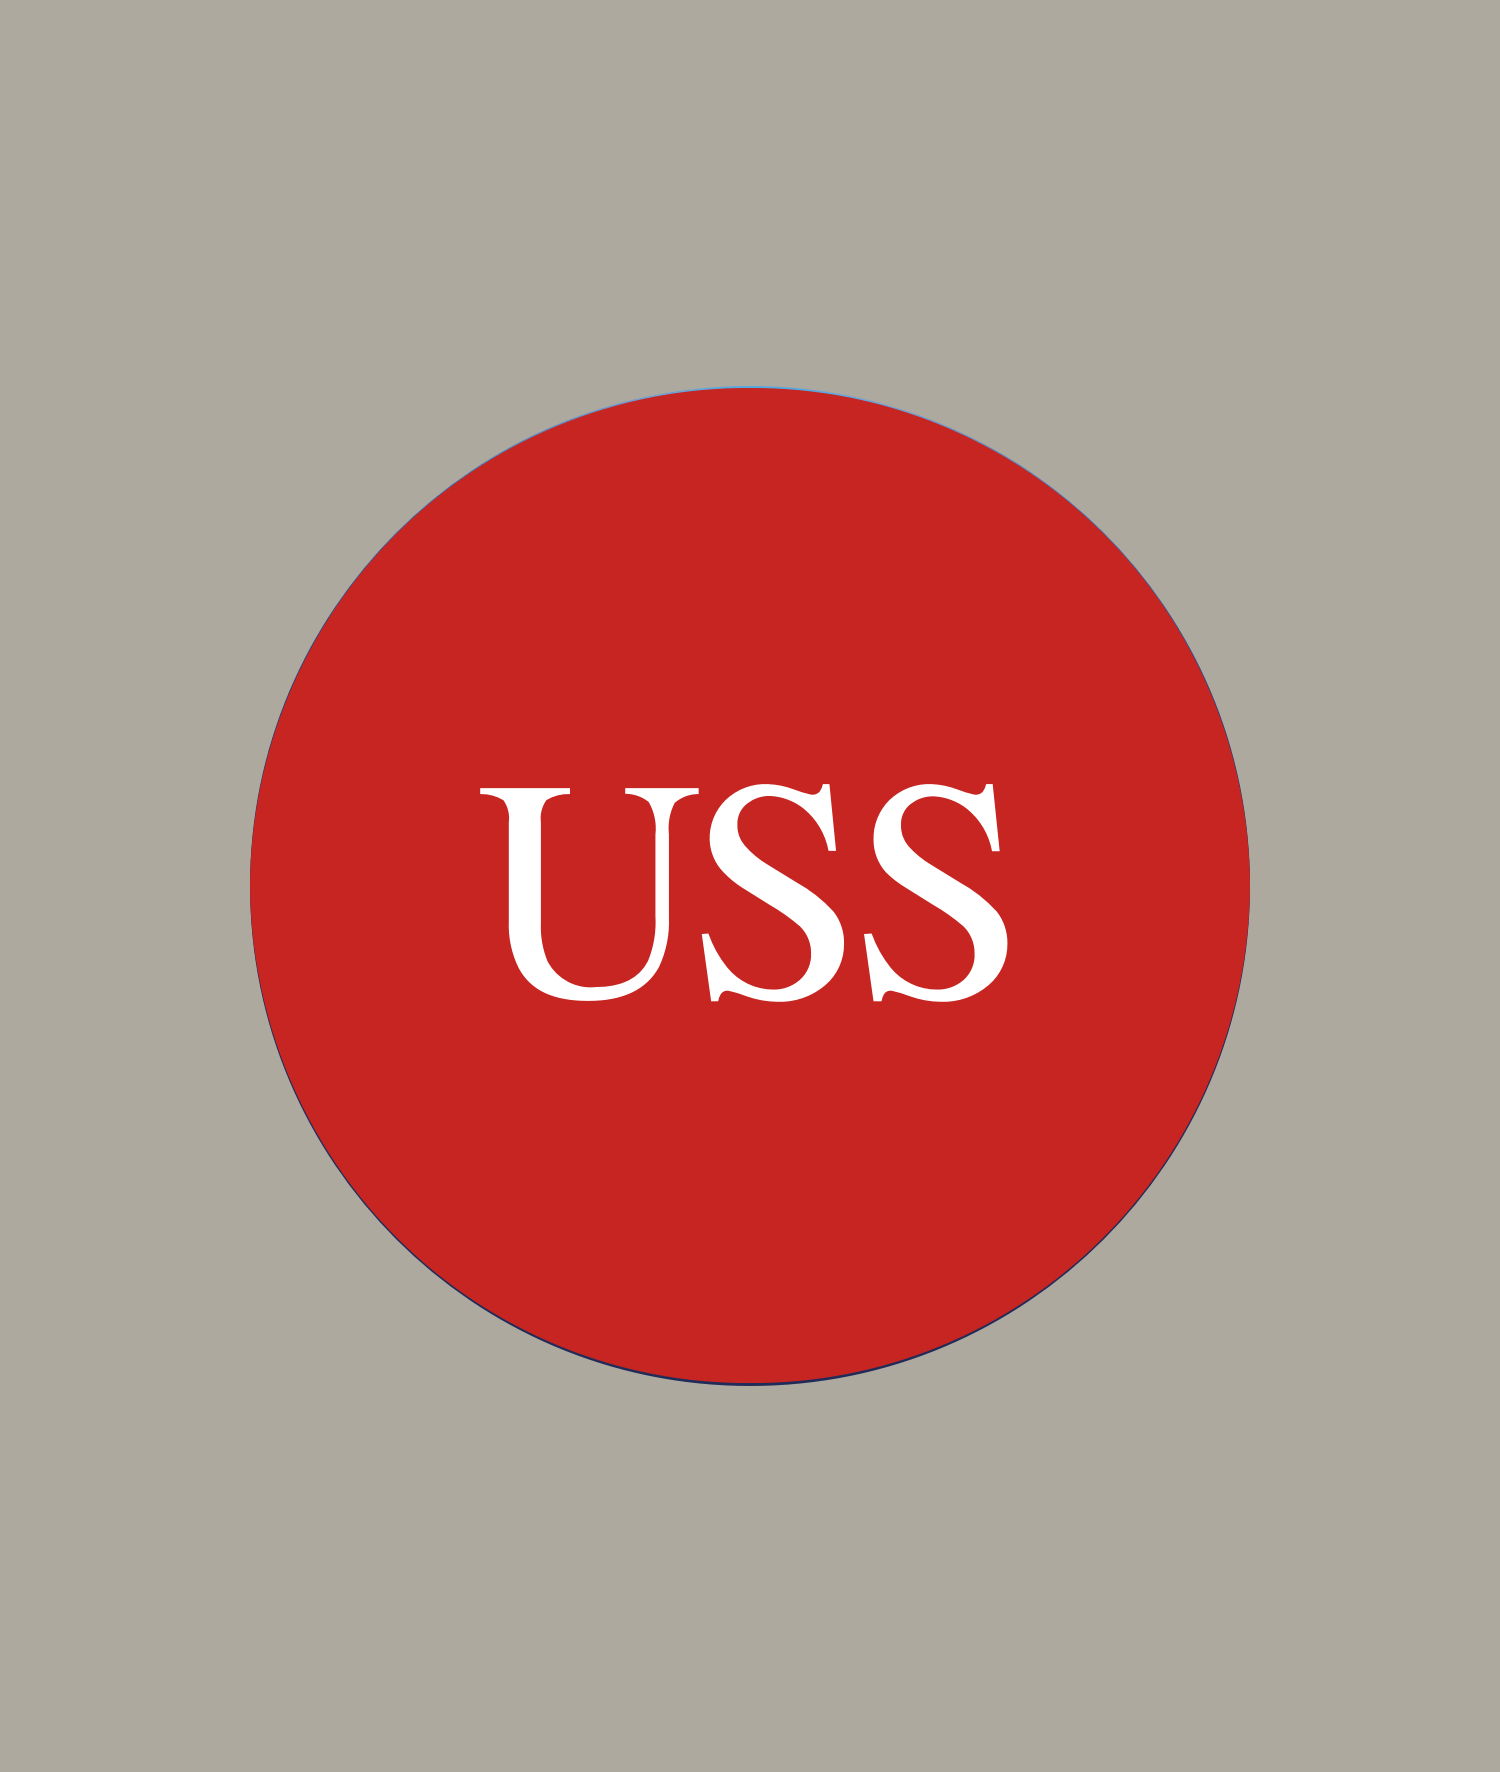 USS Pension Scheme